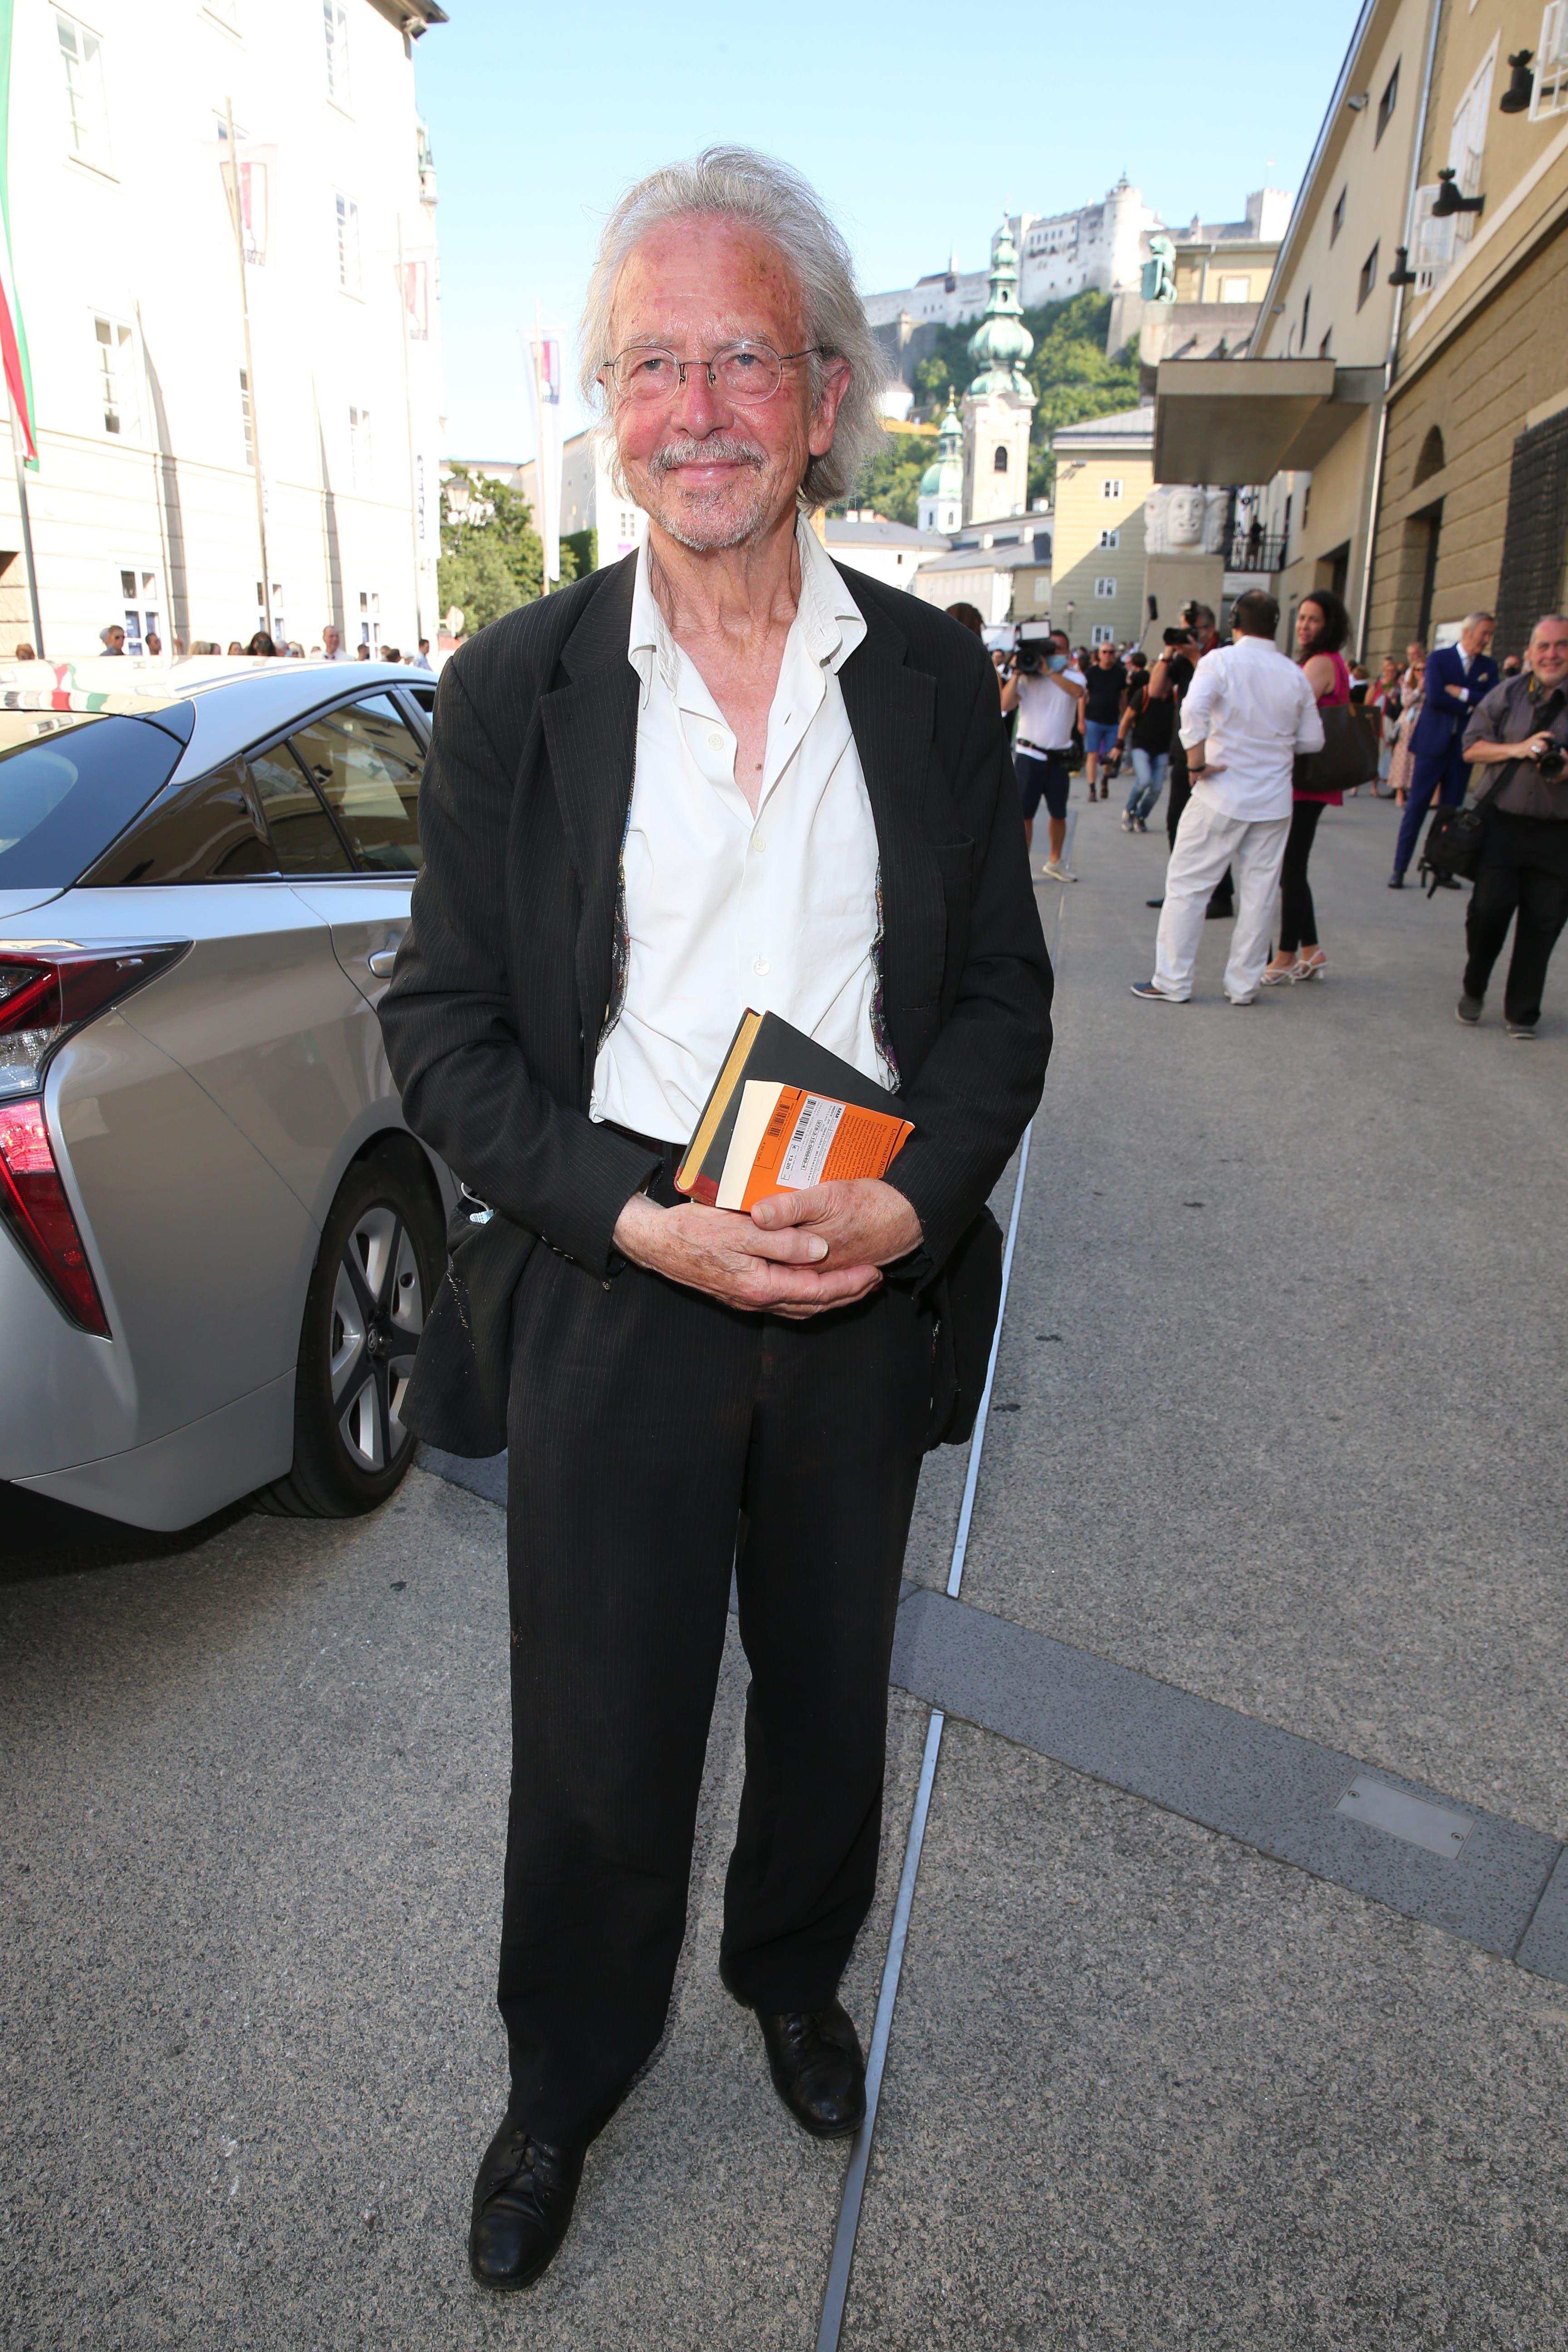 Nobelpreisträger Peter Handke kam mit Büchern in die Oper.